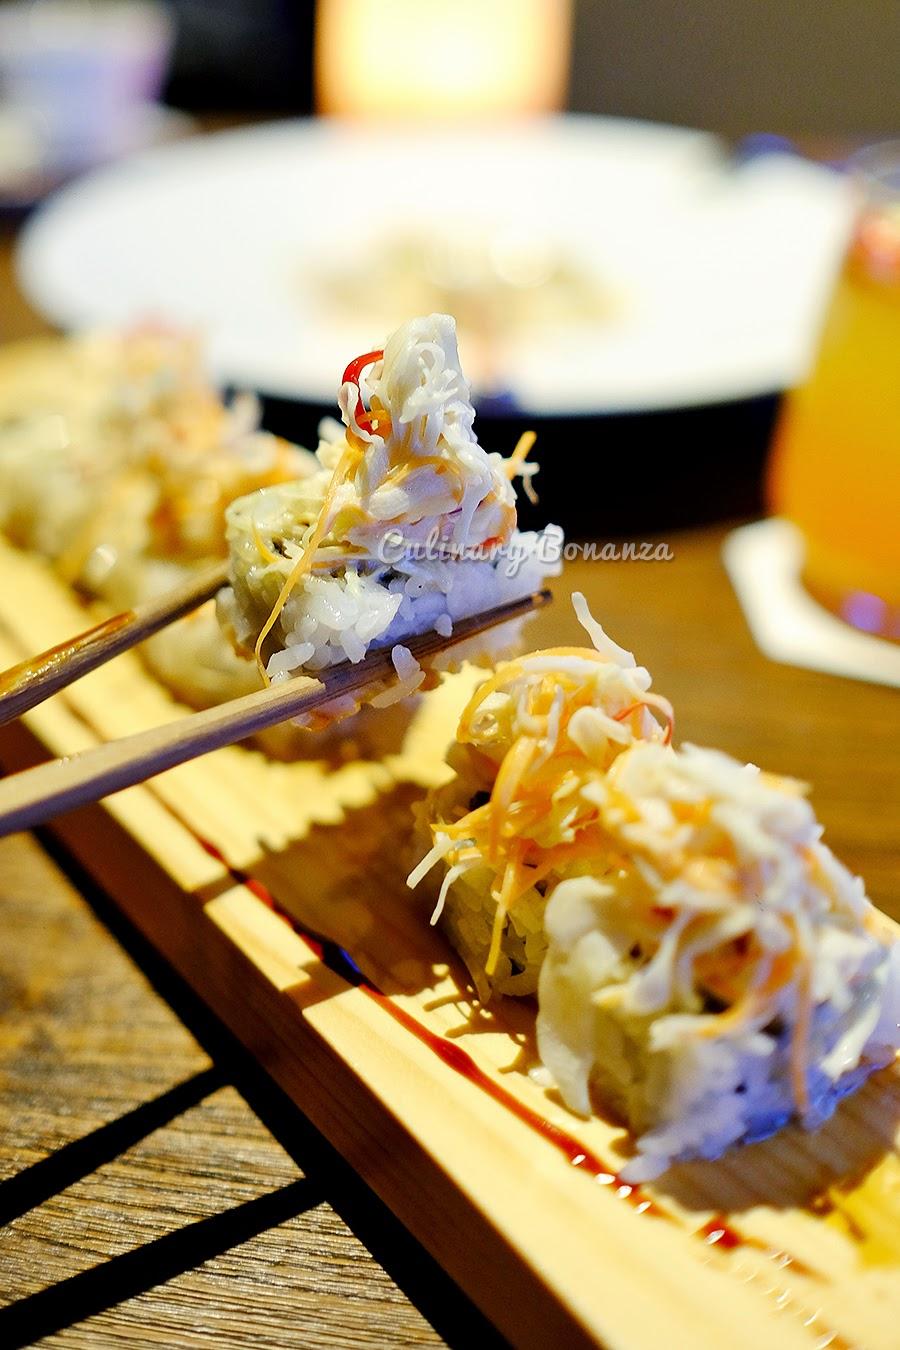 Crispy Galbi Rolls (sushi with Korean braised short rib & coleslaw)